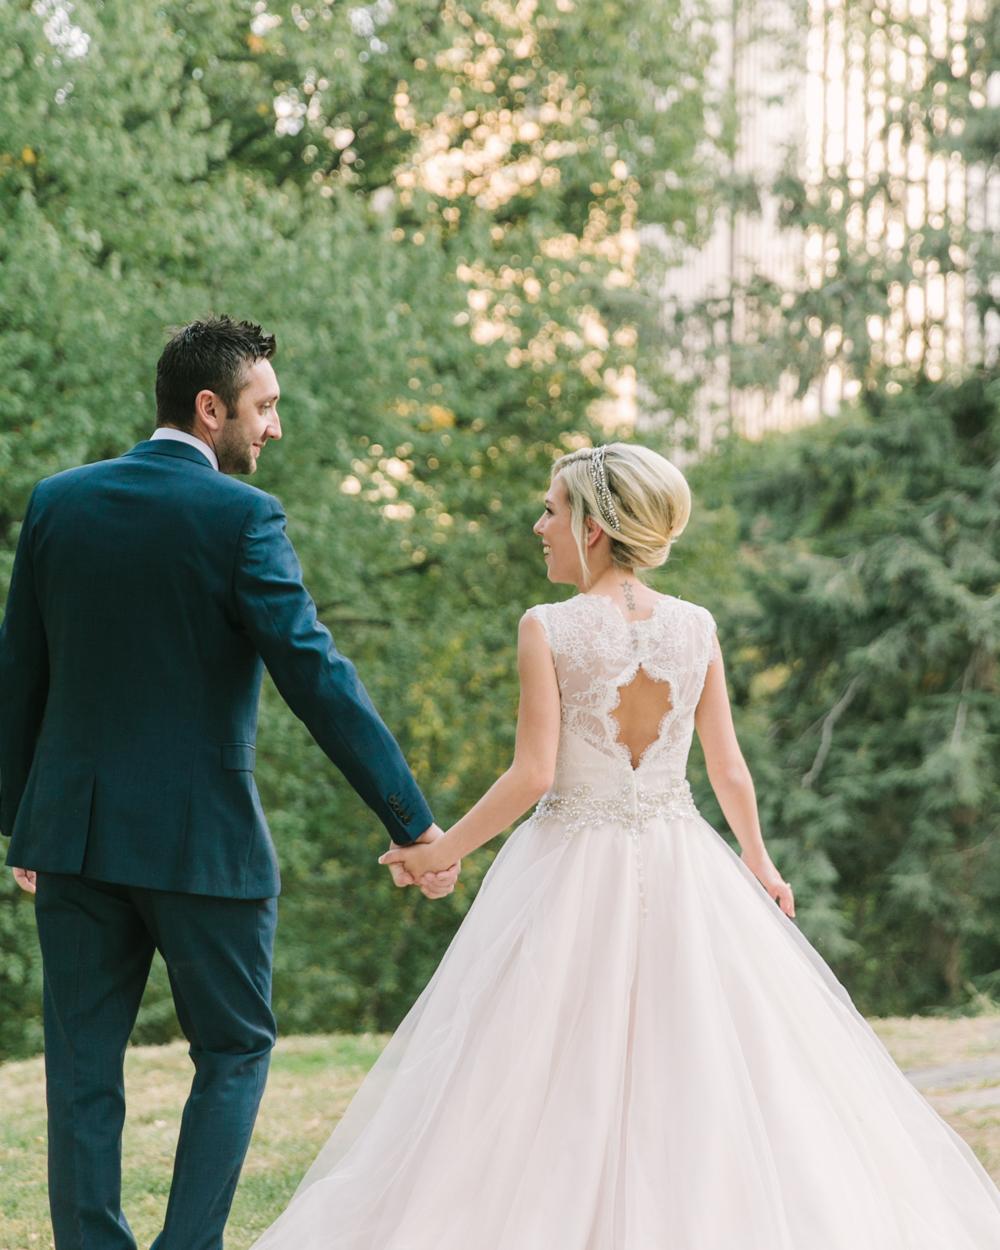 Wedding_photography_by_Tanya_Isaeva-13.jpg